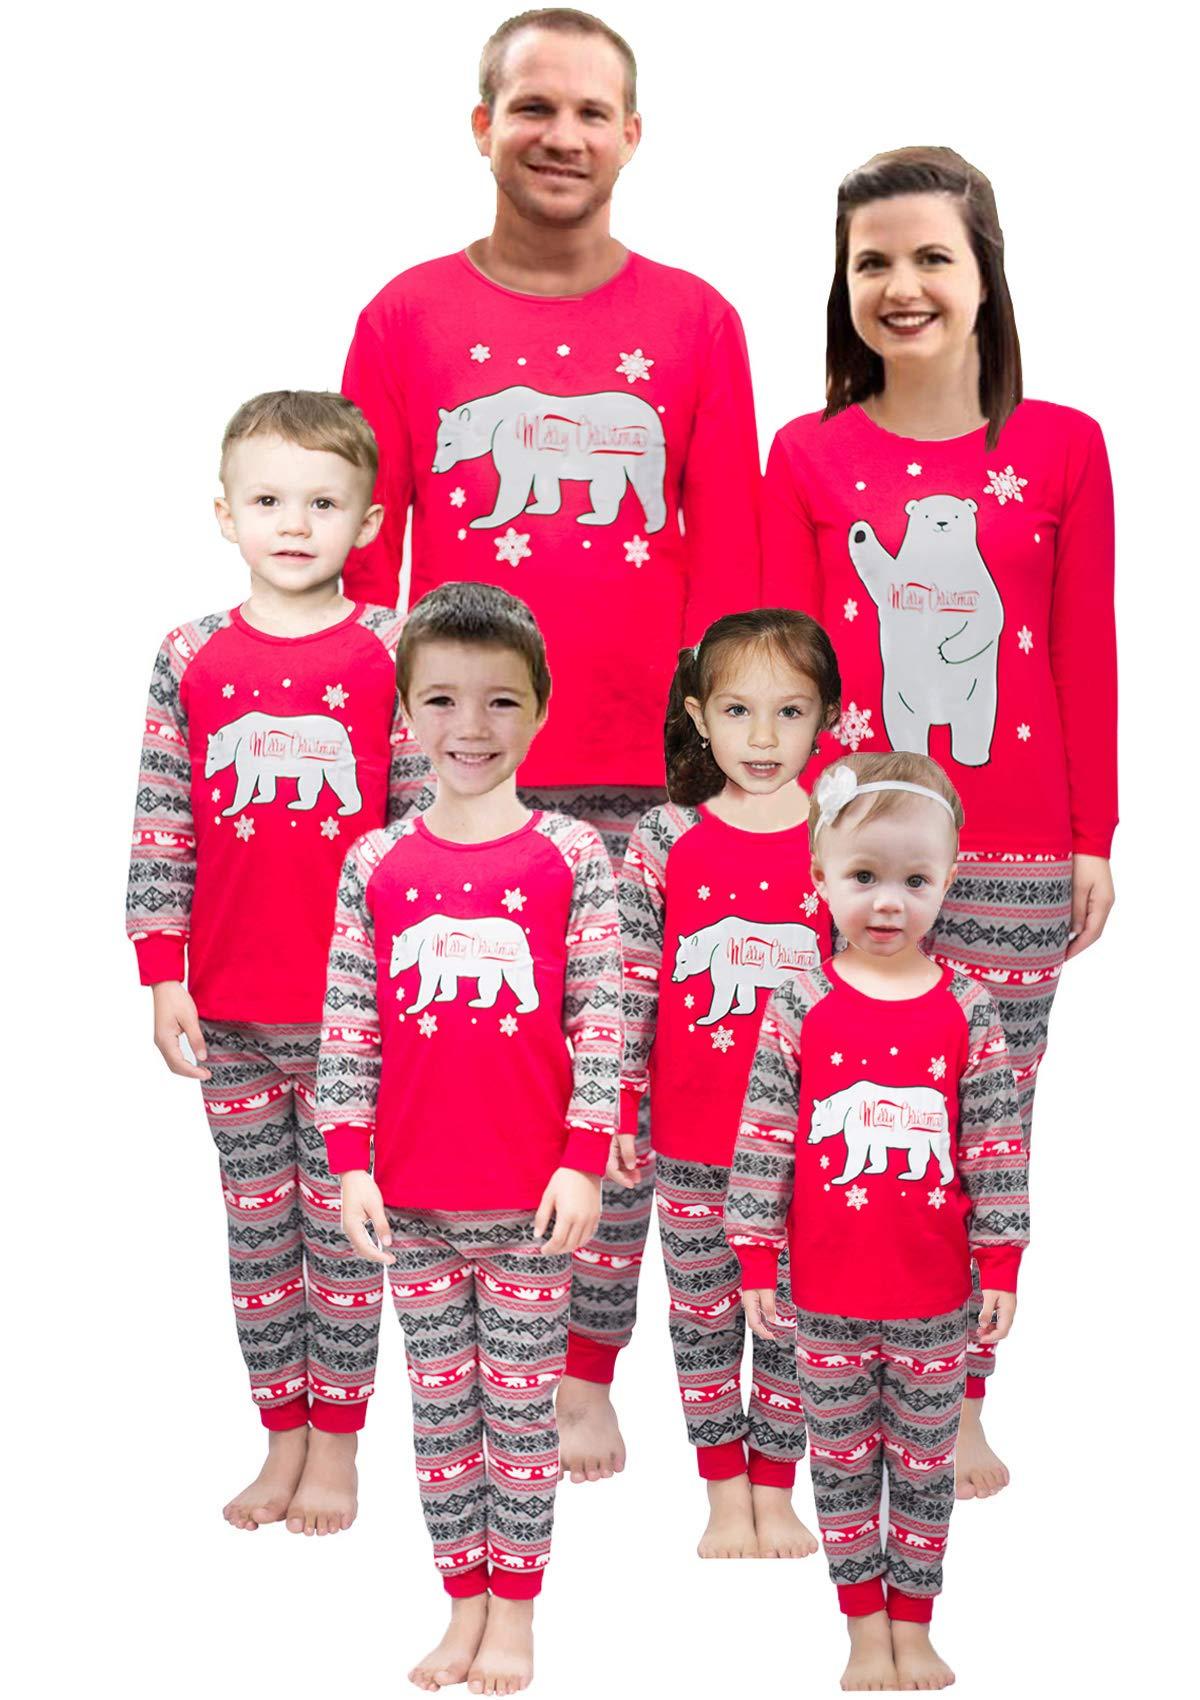 Little Pajamas Holiday Family Matching Fleece Bear Plaid Pajama PJ Sets  Women XL 9da5f4d01